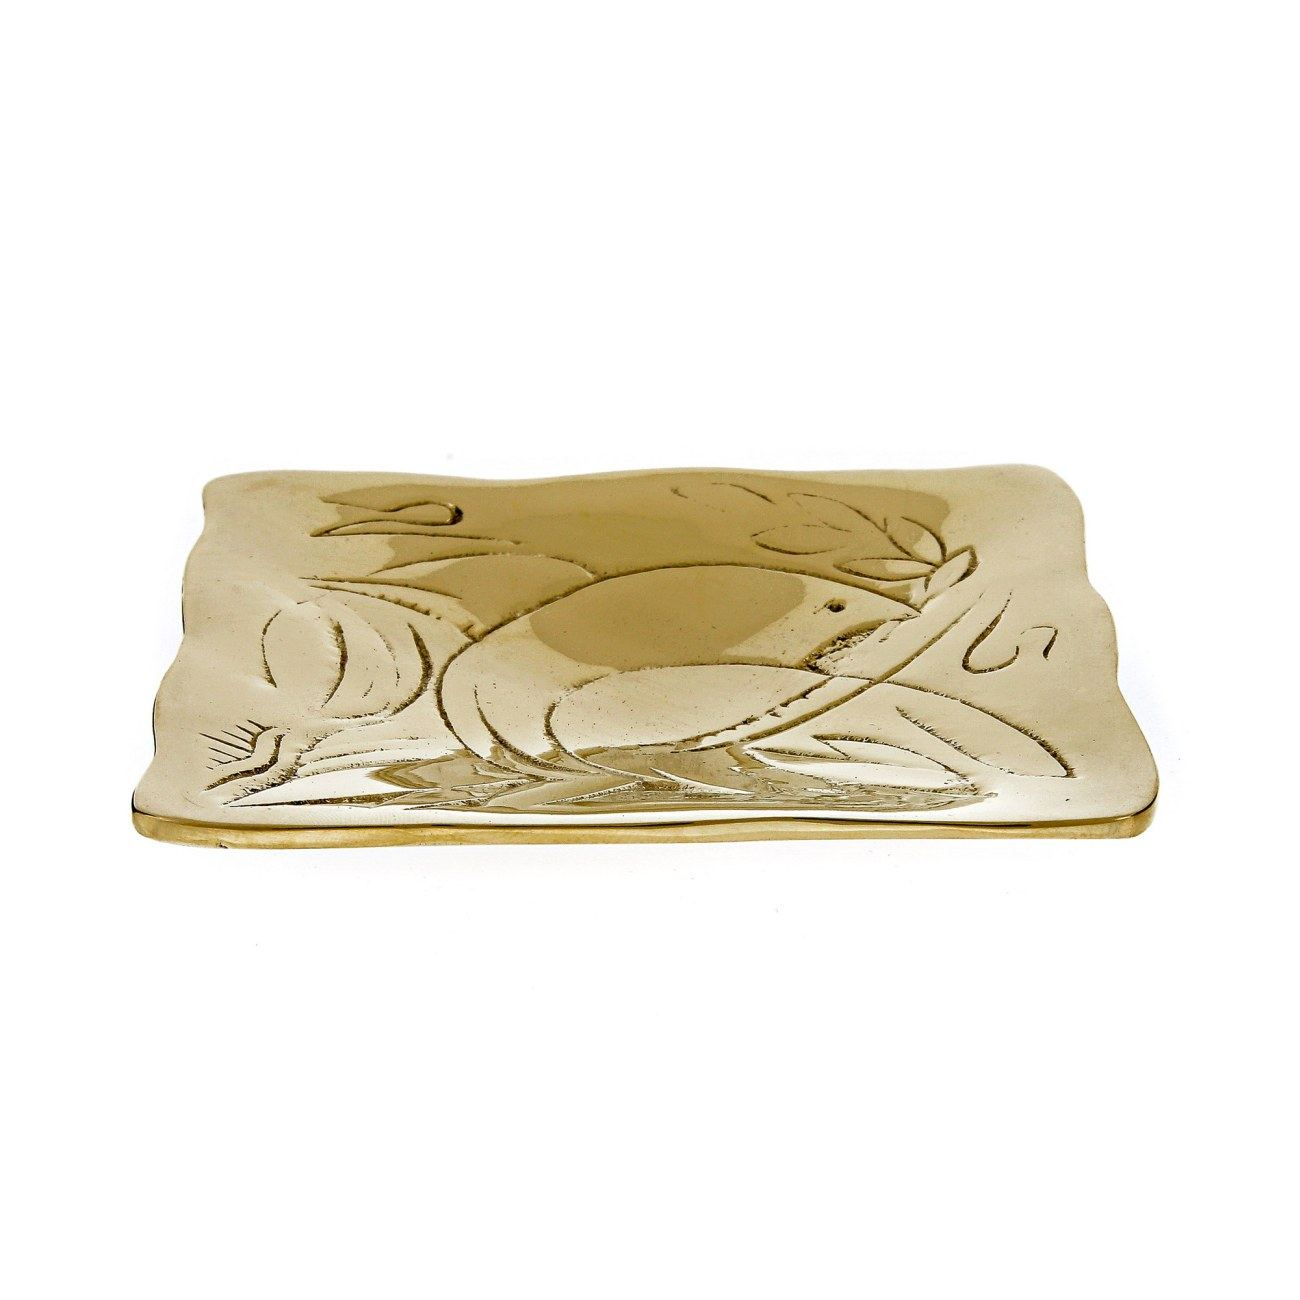 Decorative Metal Plate Engraved Dove Bird Design - Handmade Solid Bronze Gold Color 9.5x9.5cm  sc 1 st  Elite Crafters & Decorative Metal Plate Engraved Dove Bird Design - Handmade Solid ...